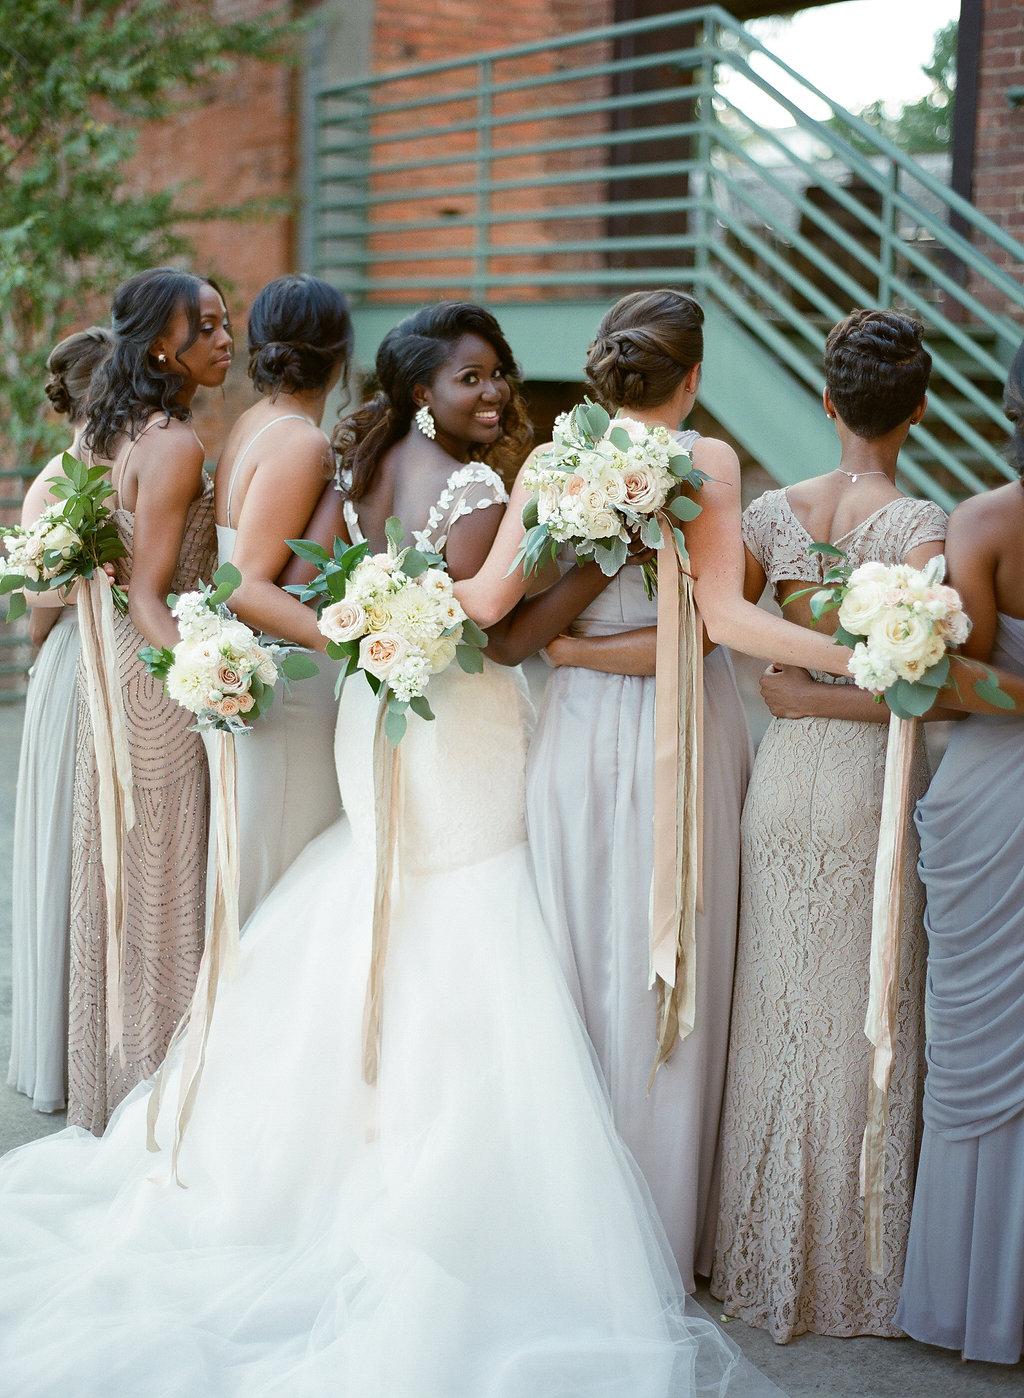 Virginia_Wedding_Photographer_Kristen_Lynne_Photography-236.jpg